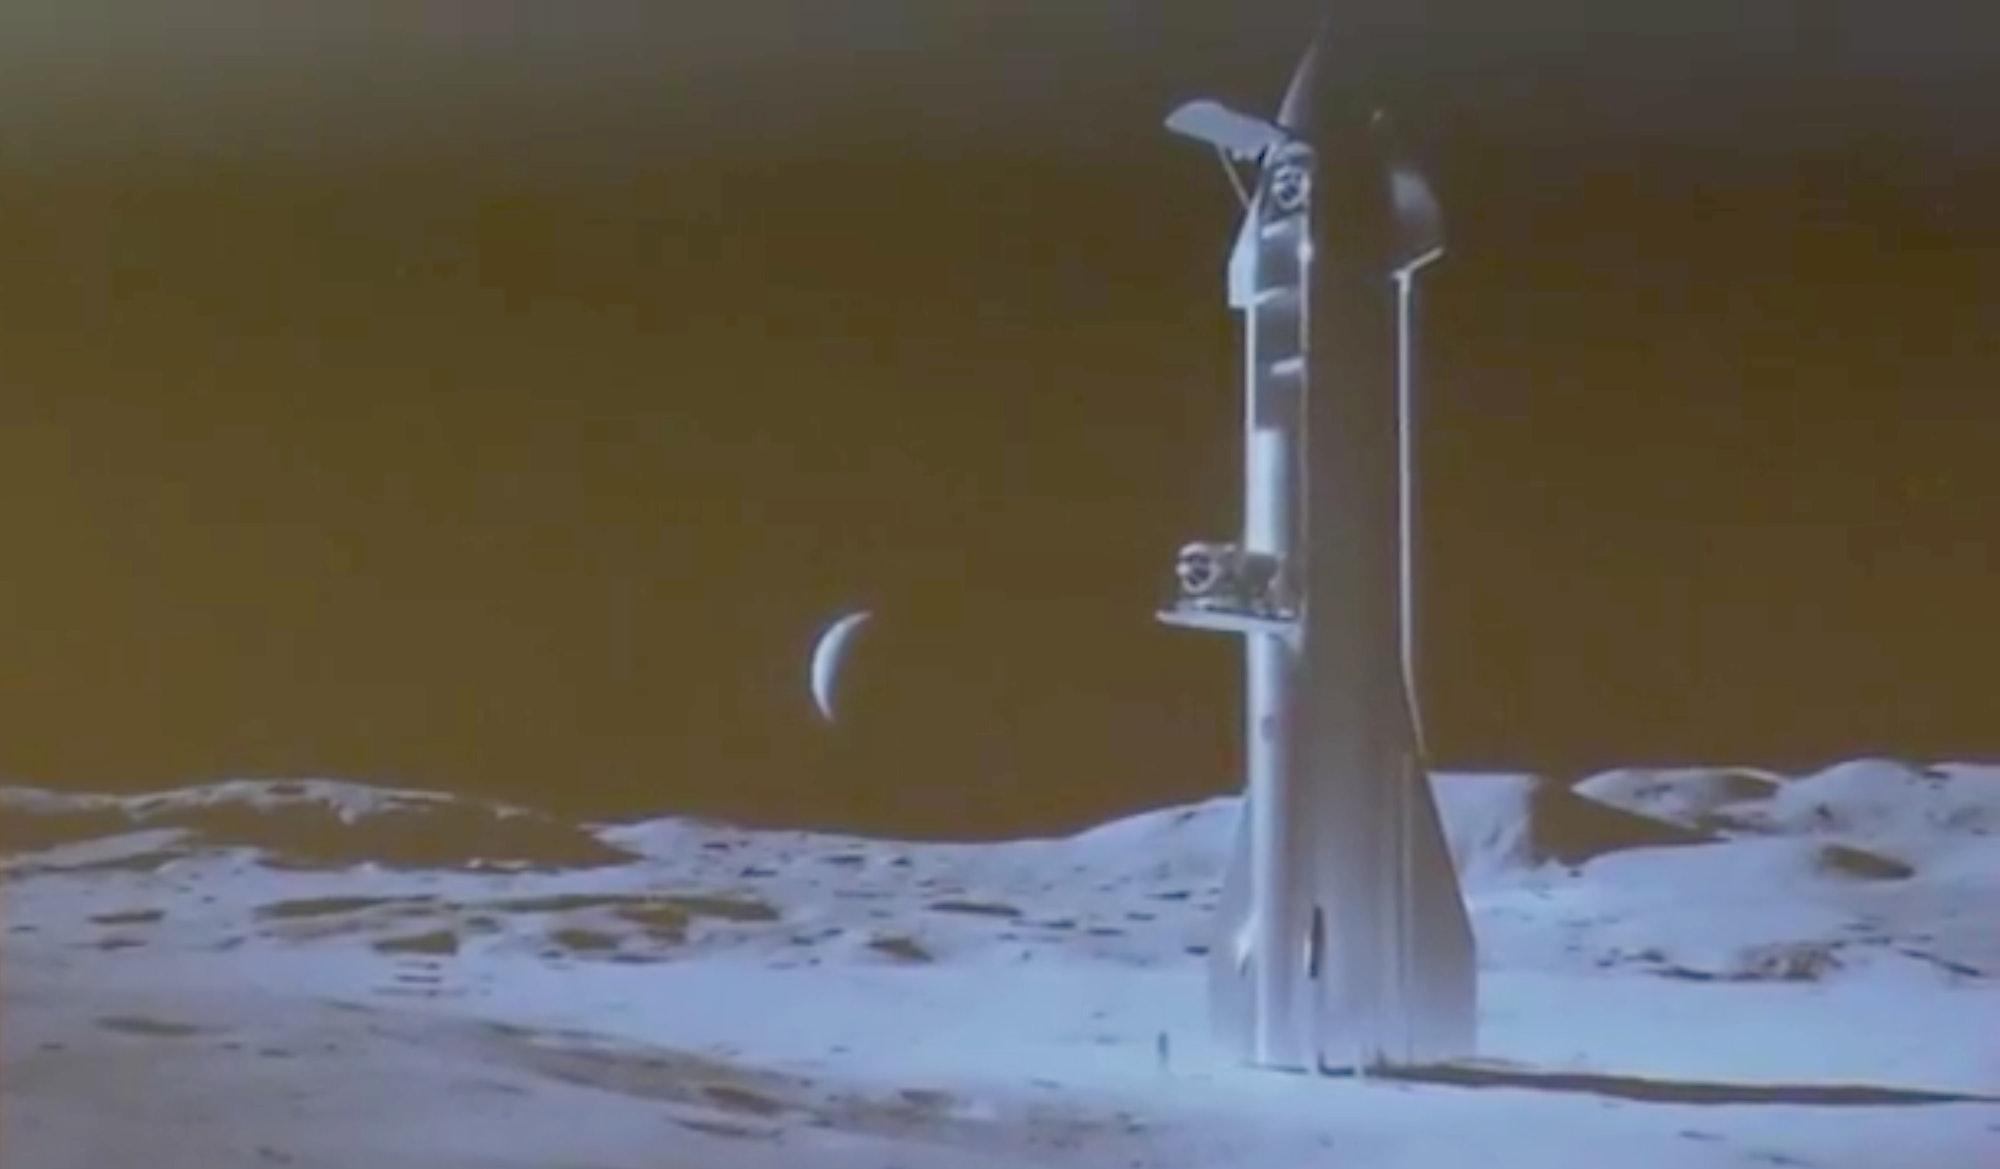 The Starship on the moon.